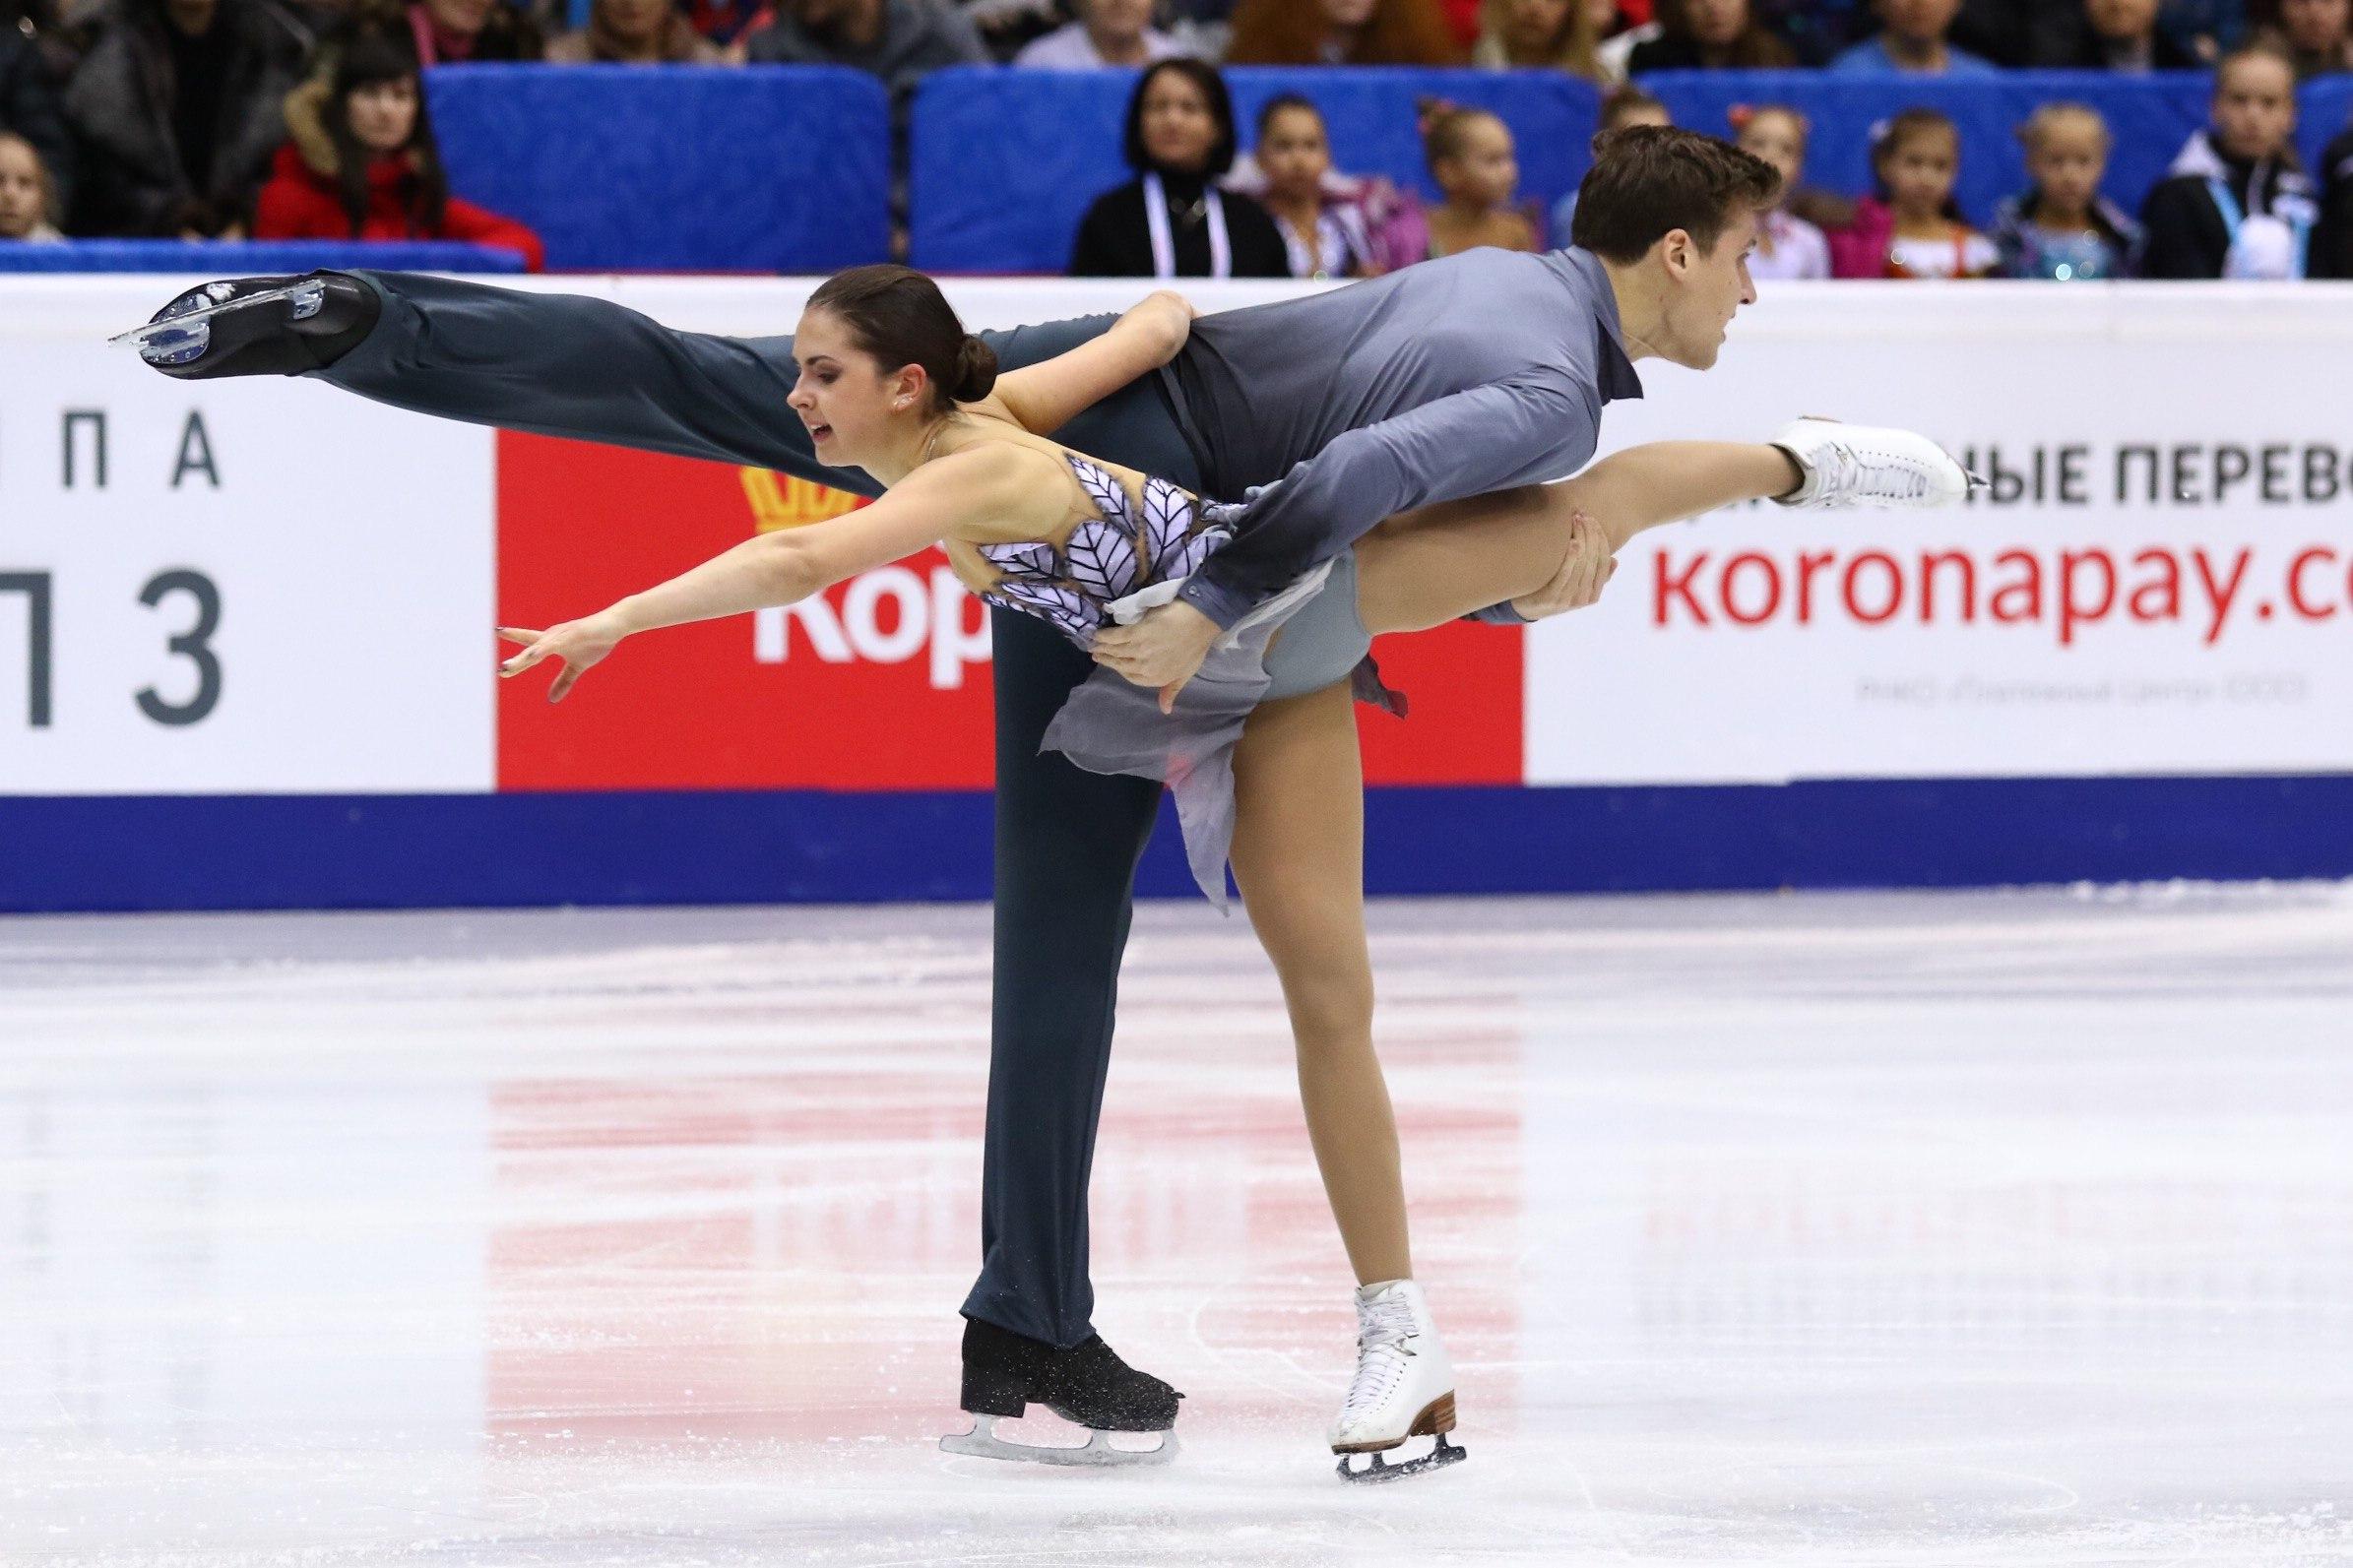 Наталья Забияко и Александр Энберт (26.12.2016)